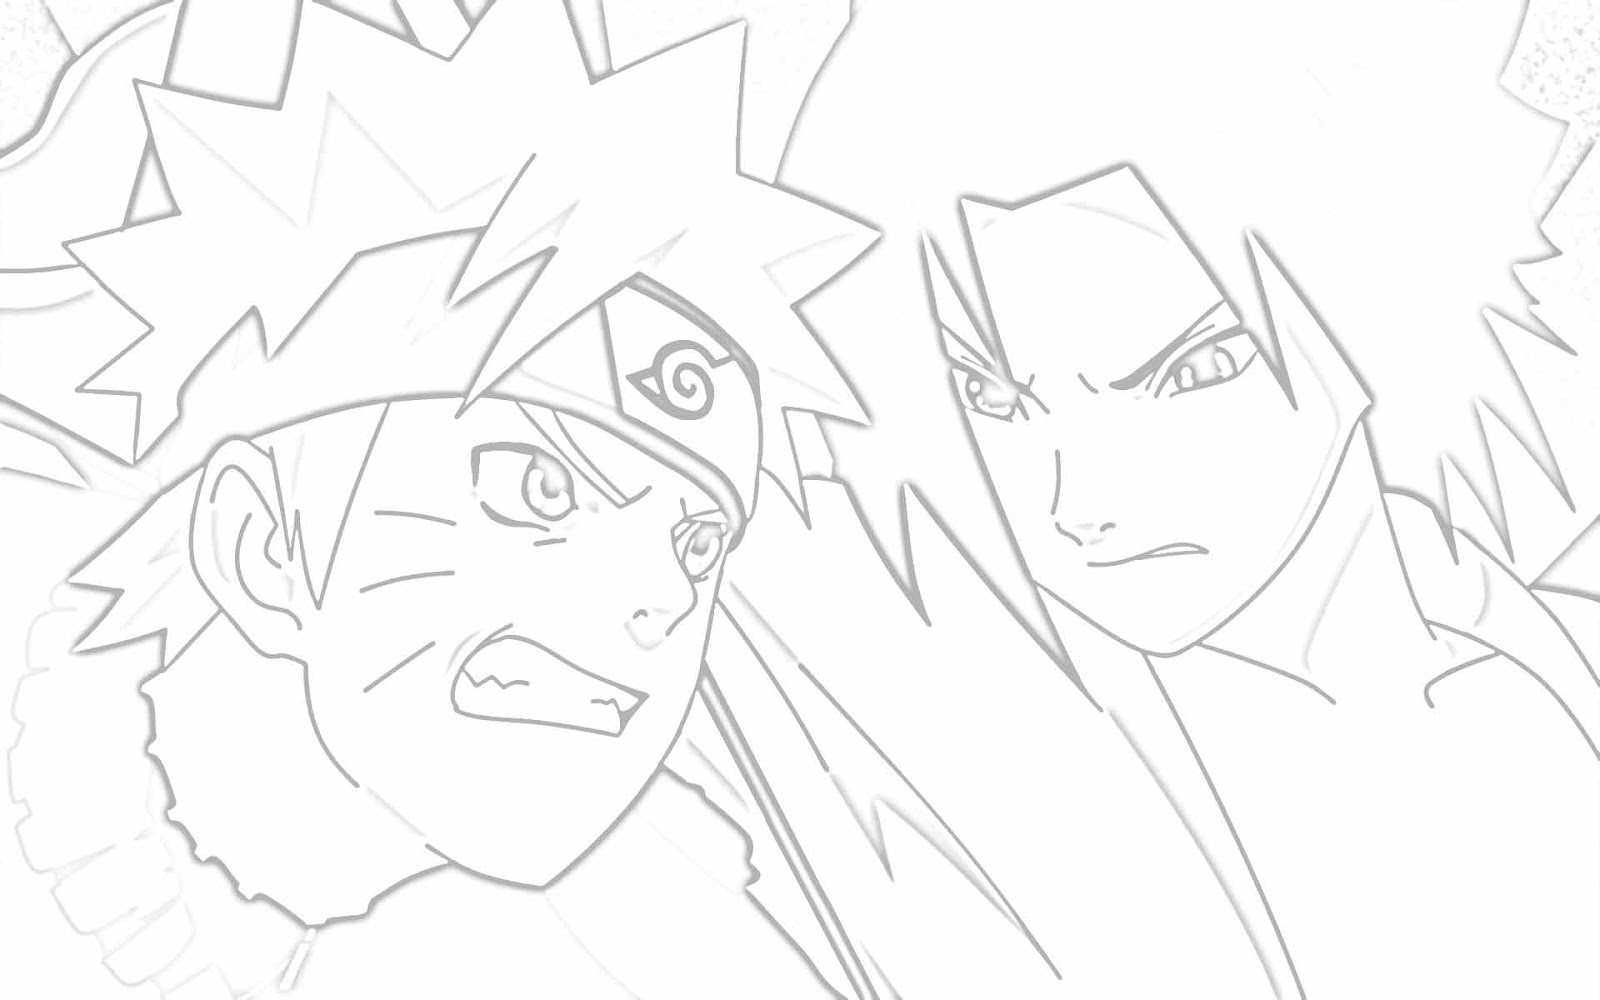 Free E Vs Naruto Coloring Pages